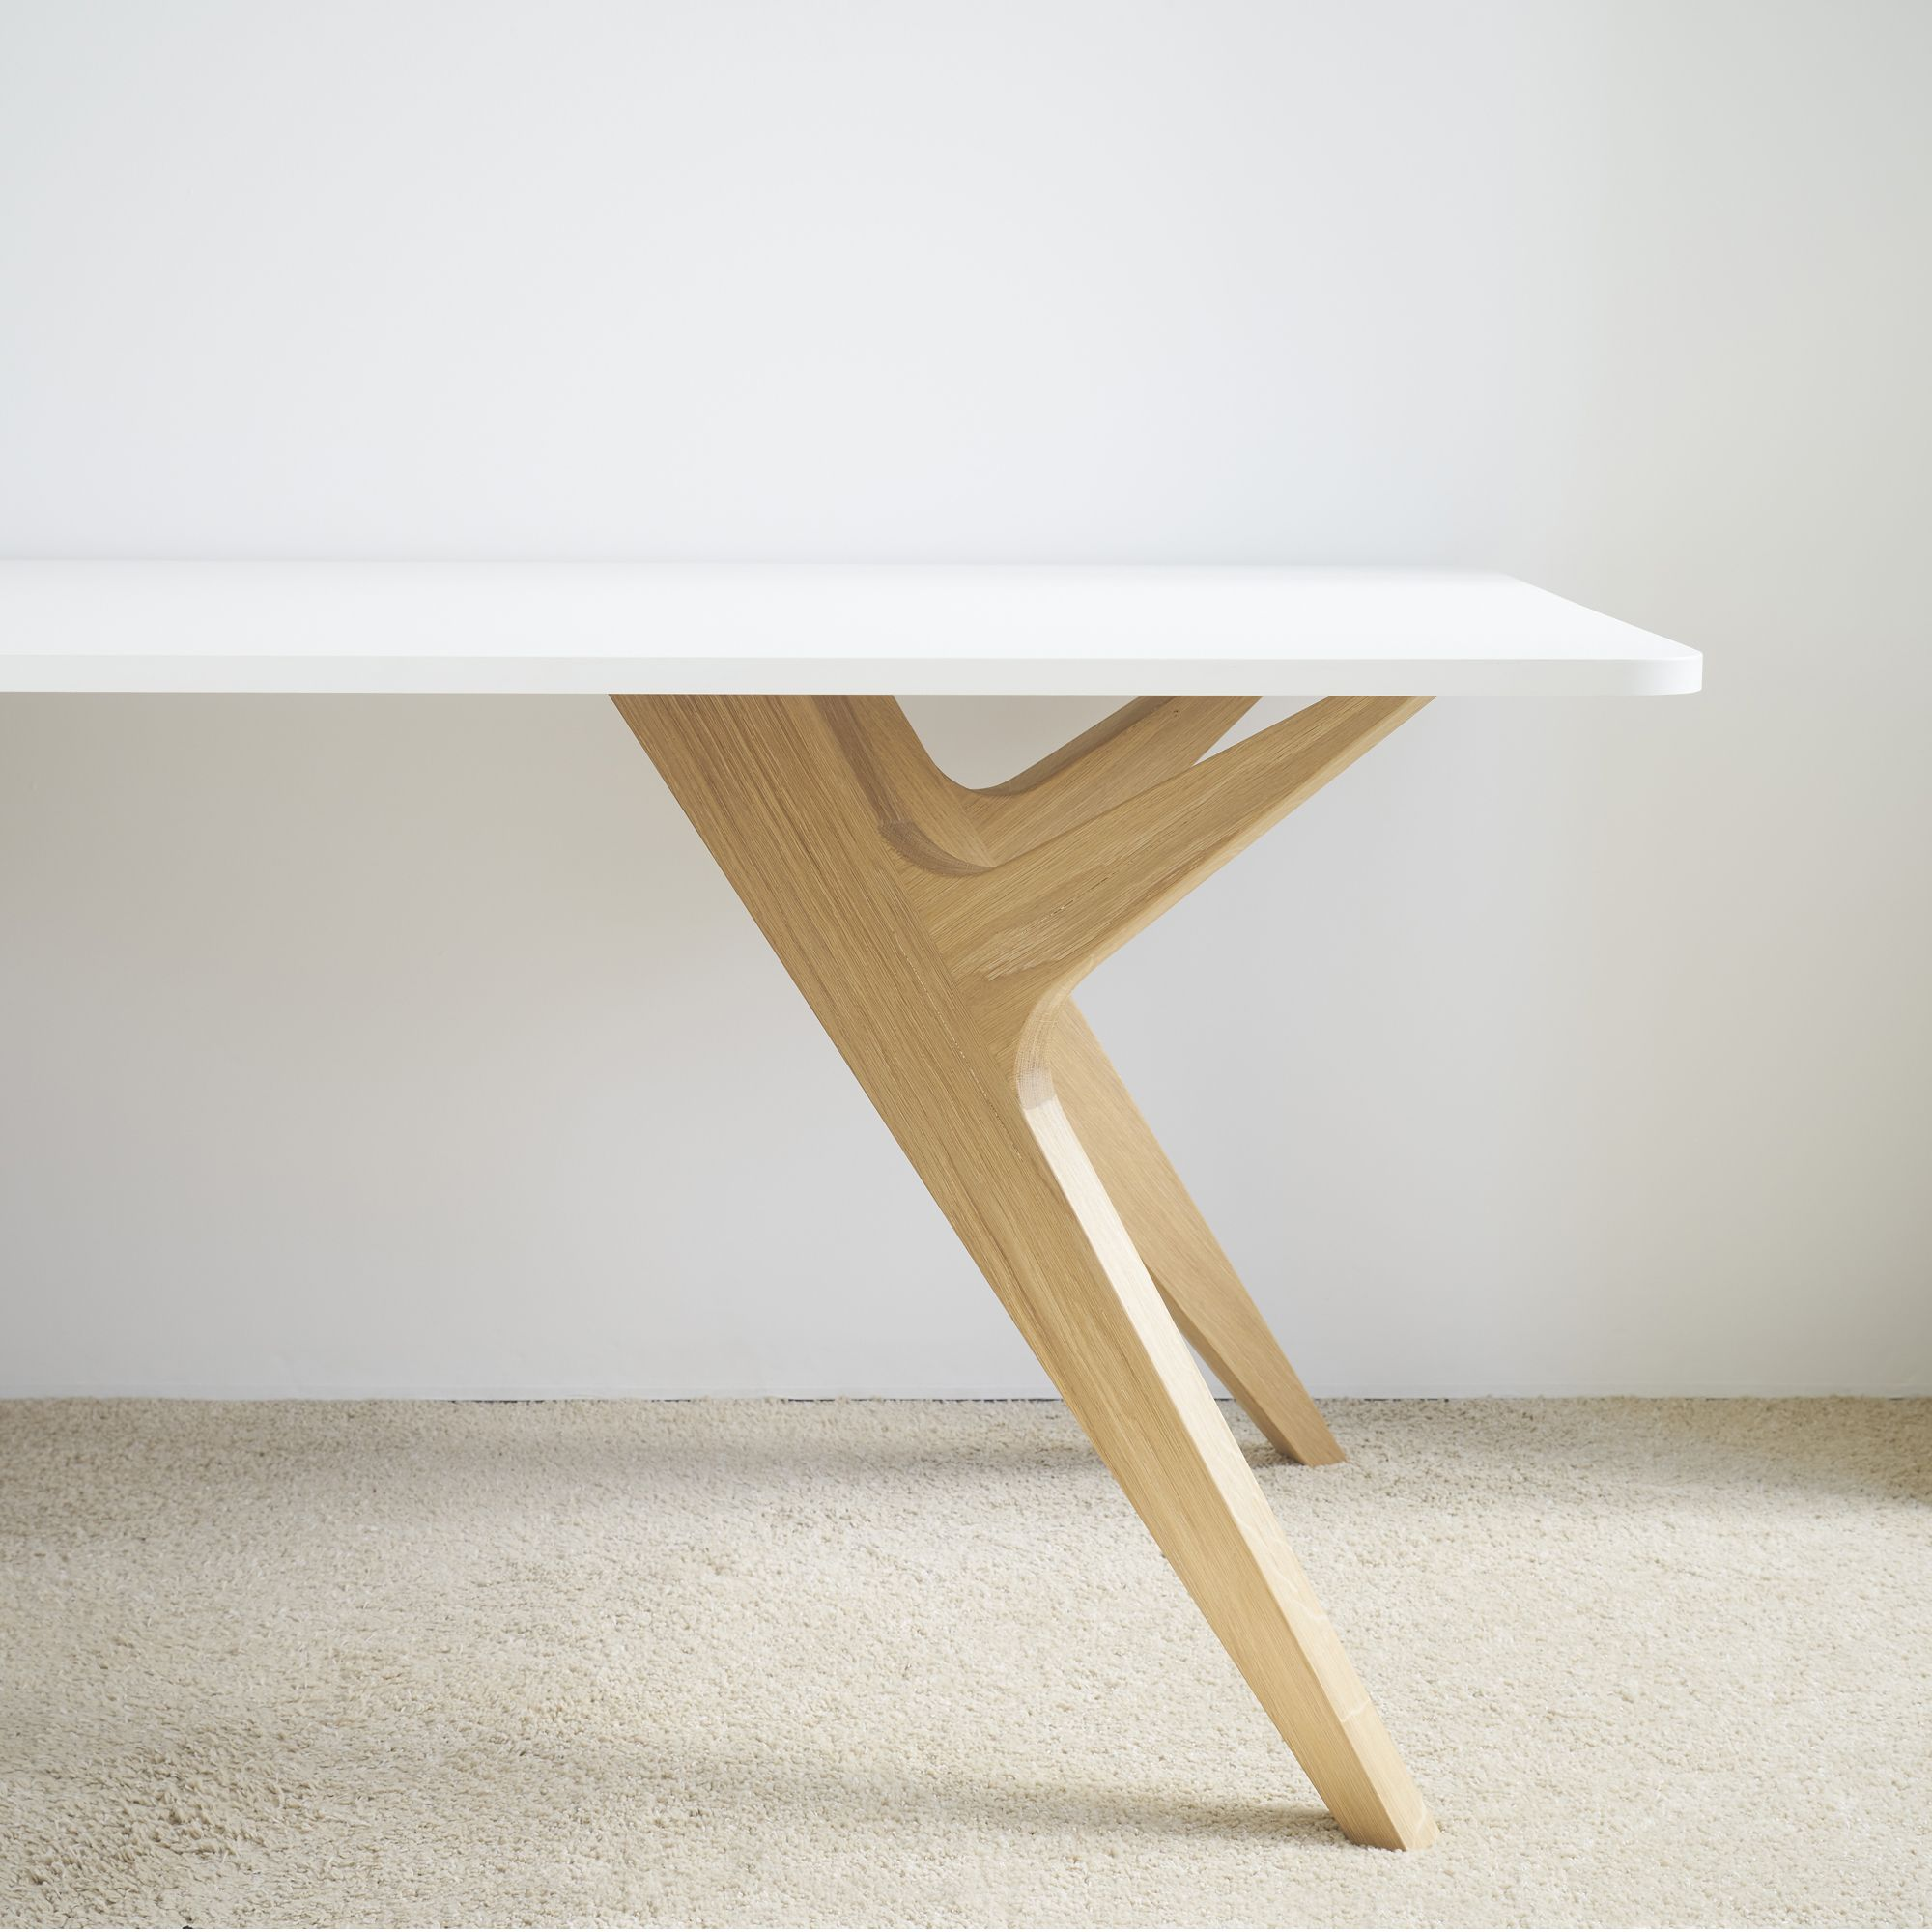 Table Bois Blanc Design Chene Made France Scandinave Audrey Savelon Table Bois Table Blanche Et Bois Pied Table Bois